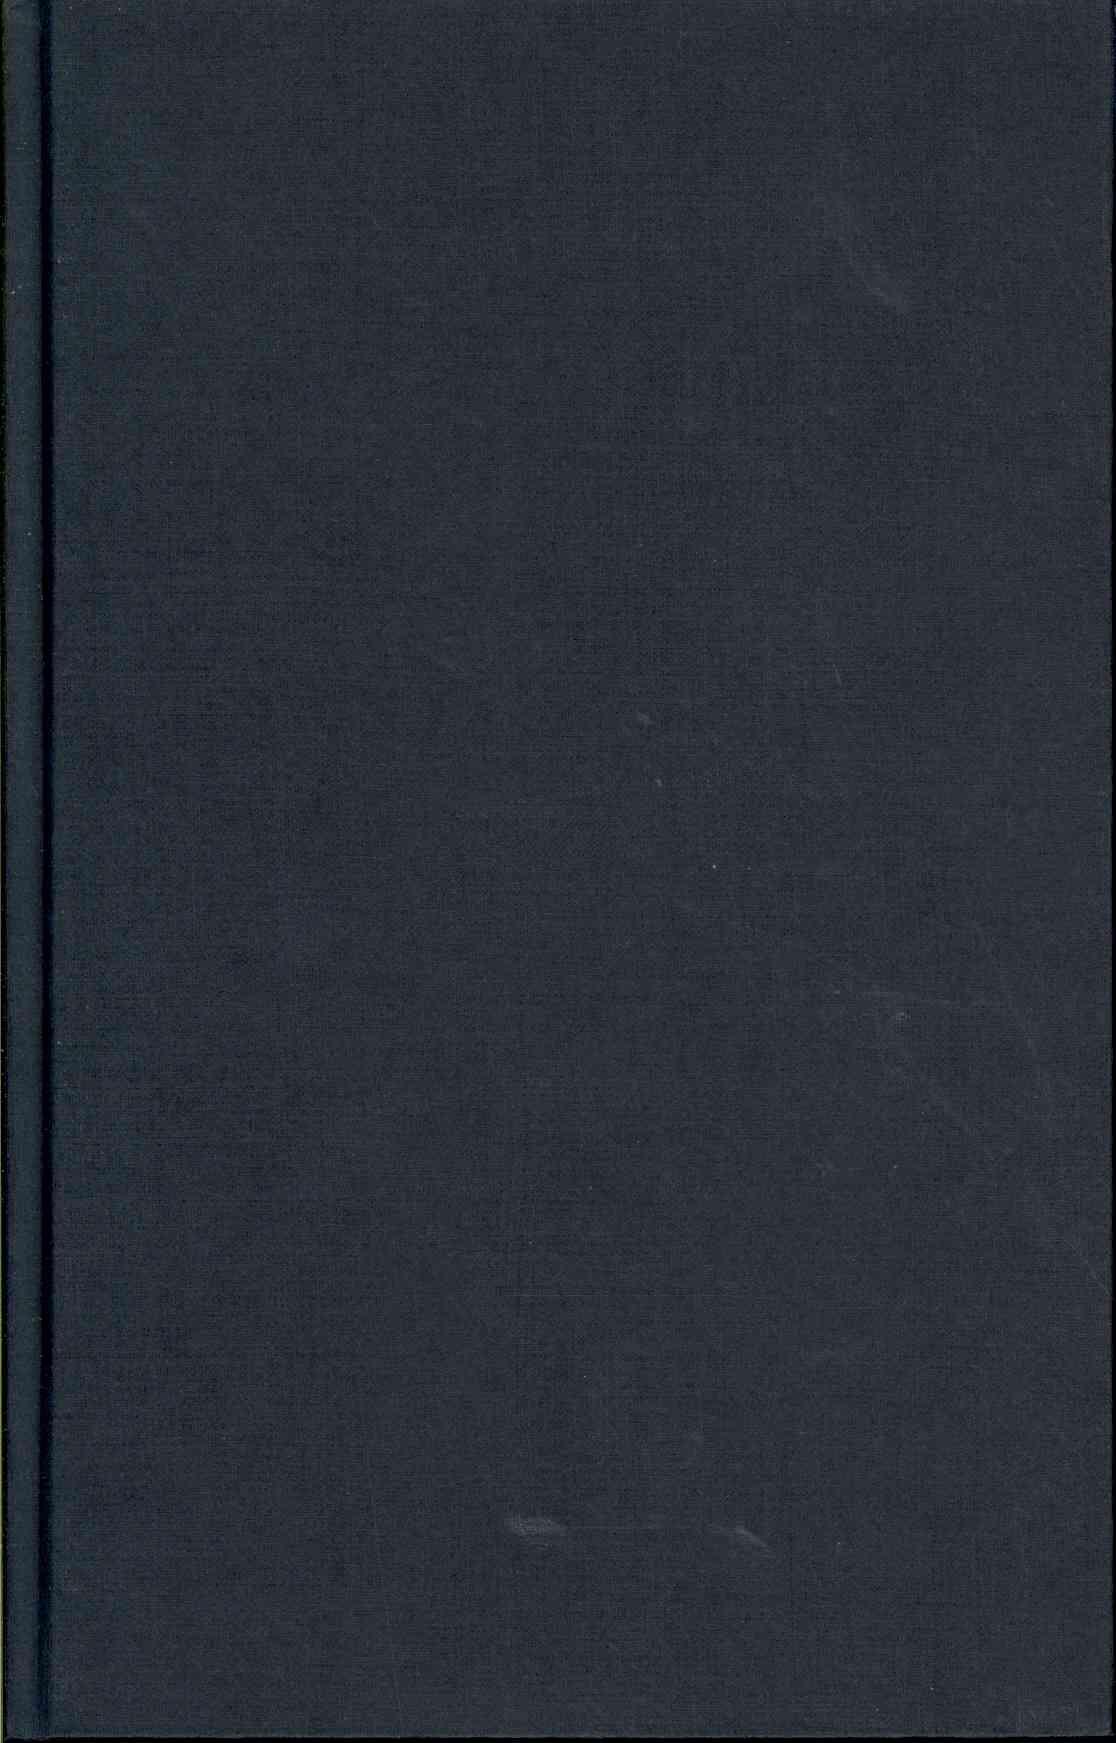 Hunting the Dark Knight: Twenty-First Century Batman (Hardcover)